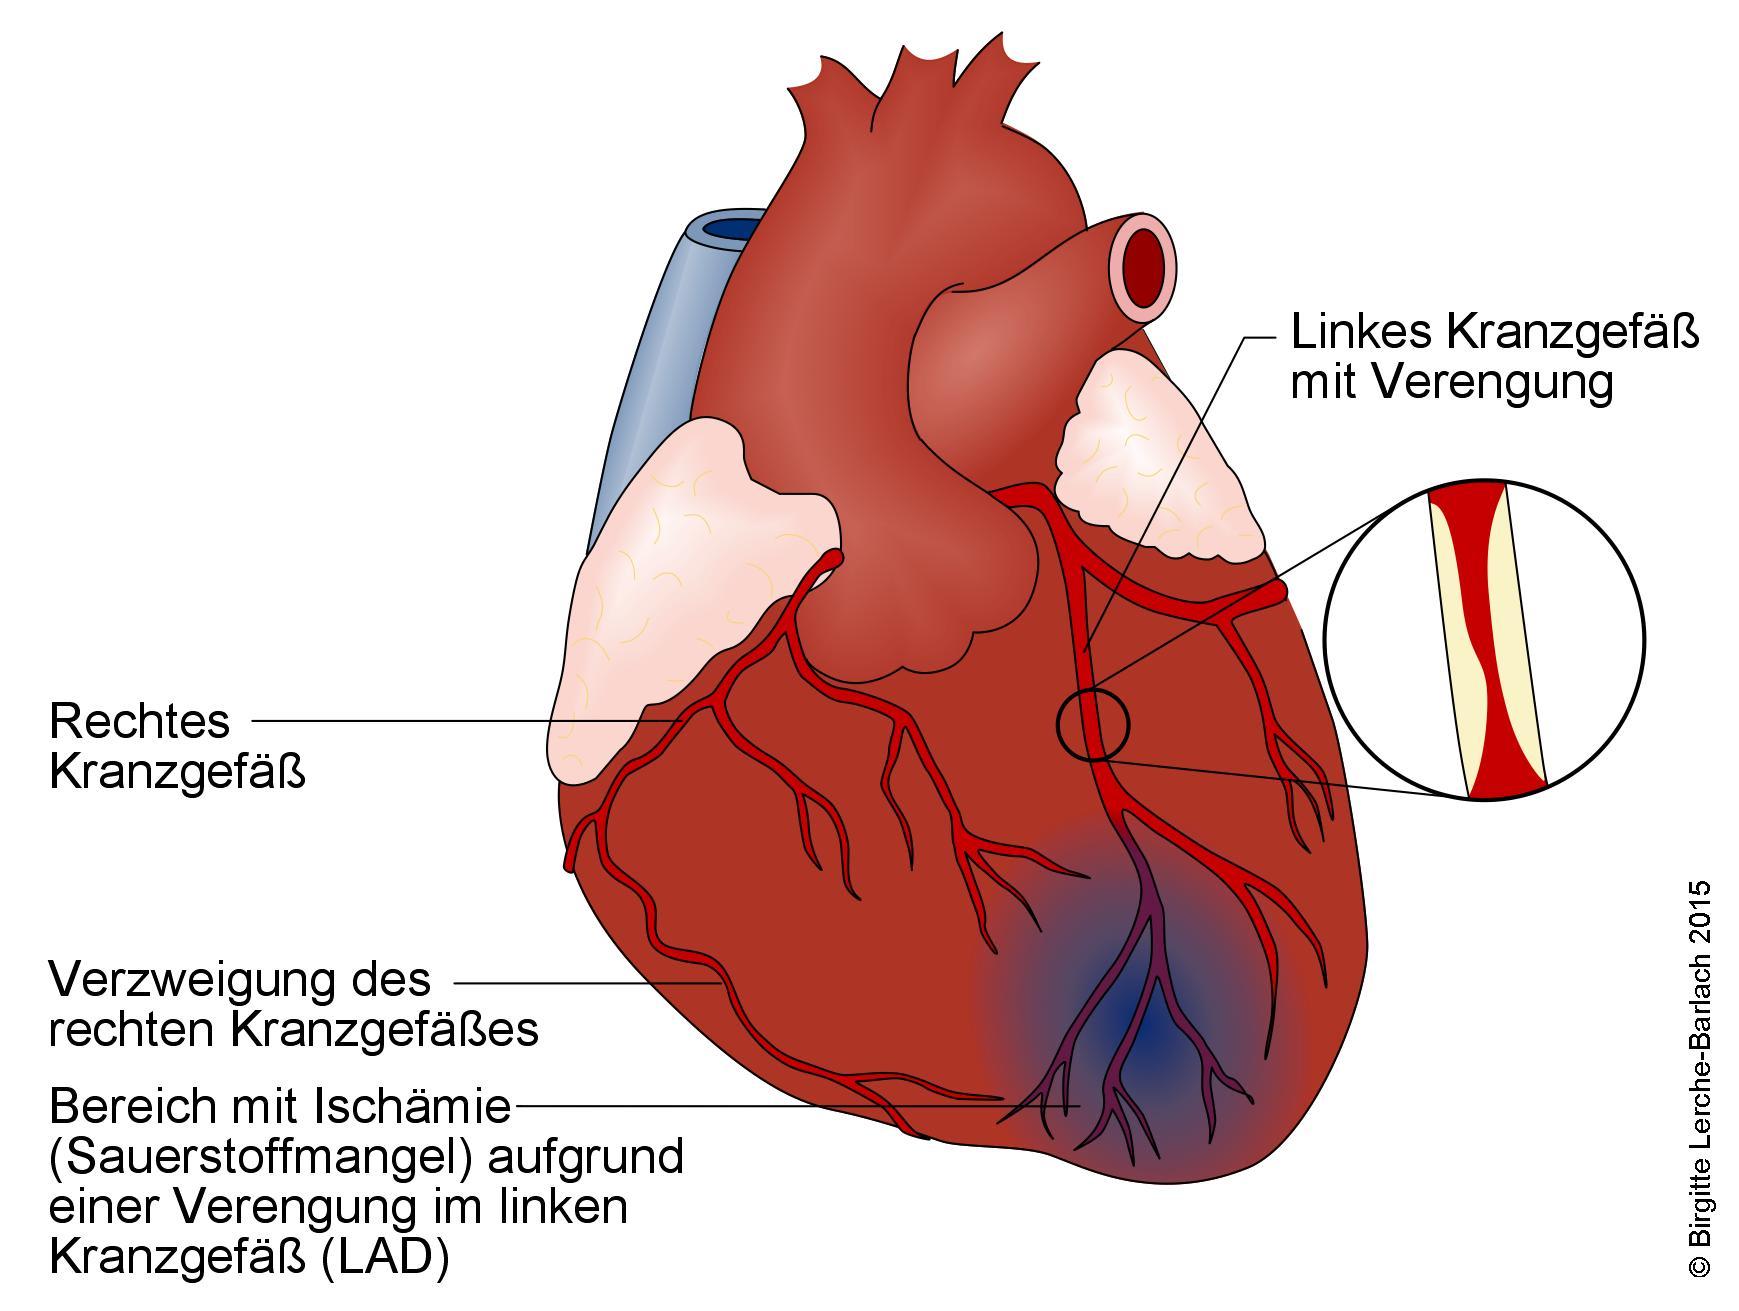 Herz mit Angina pectoris.jpg